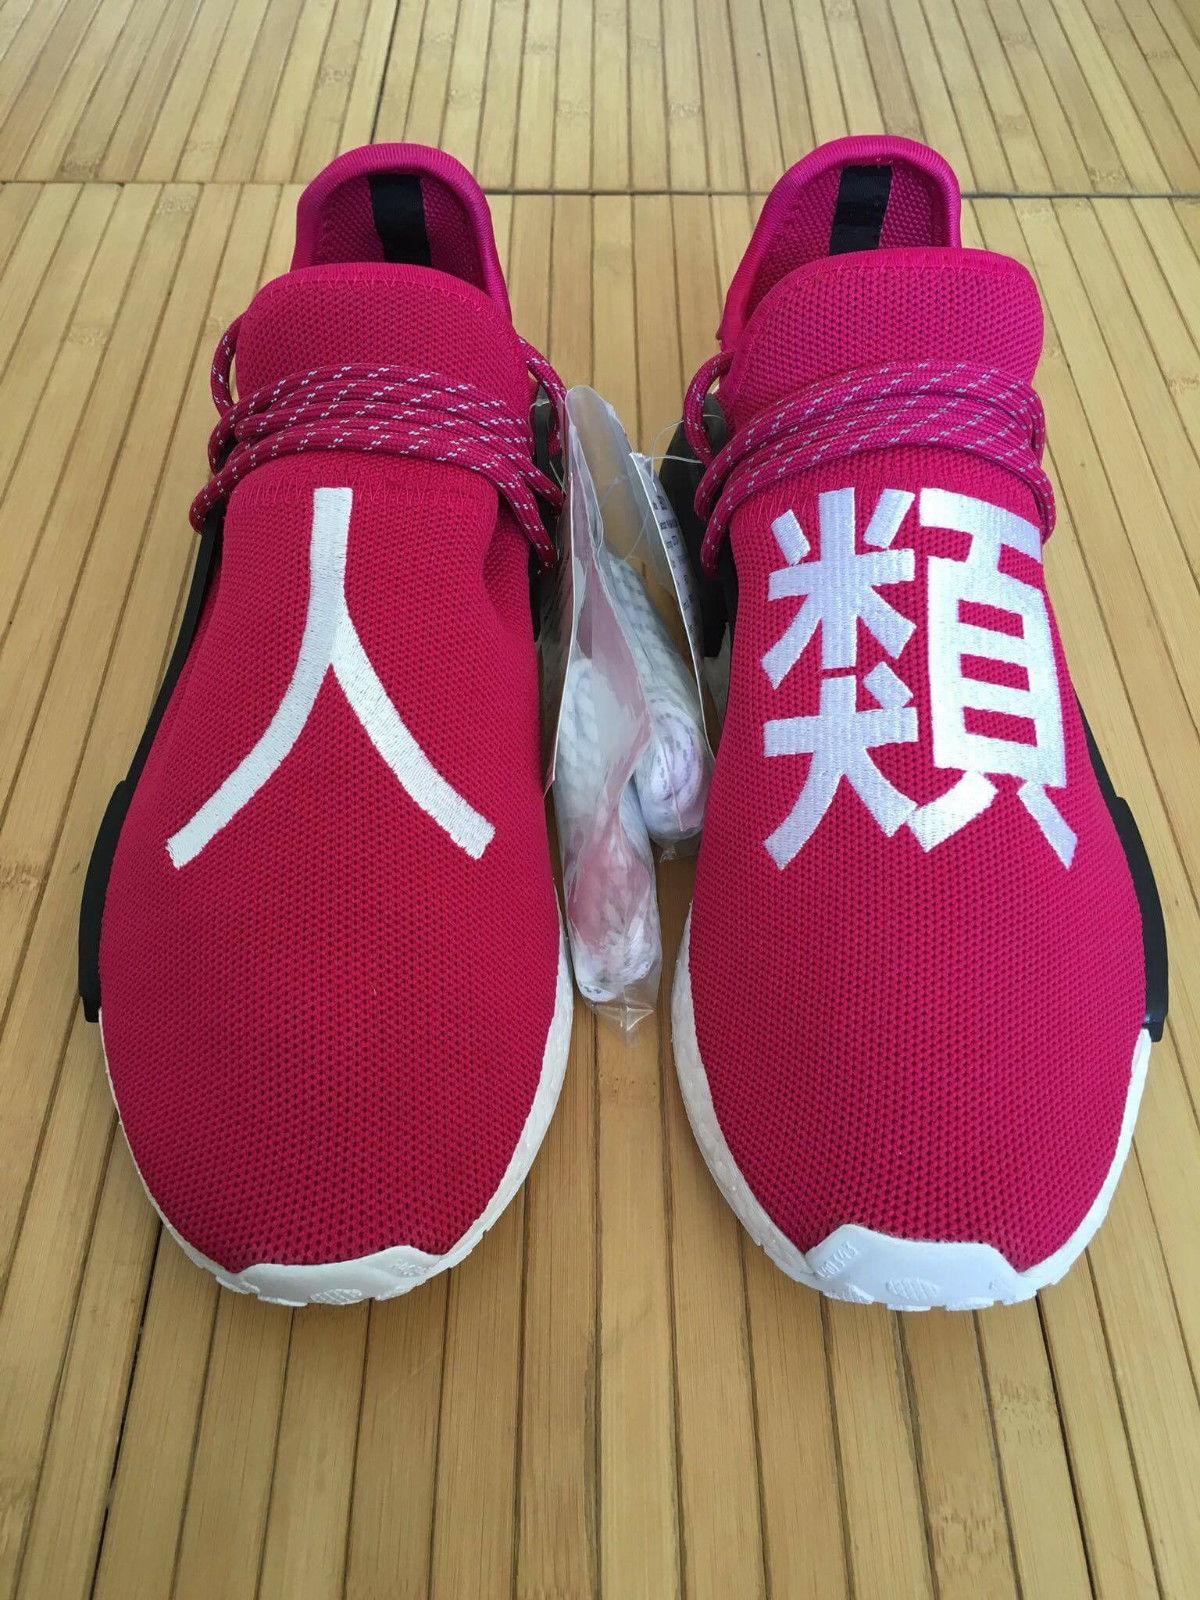 UnReleased Sample Adidas NMD Human Race 1